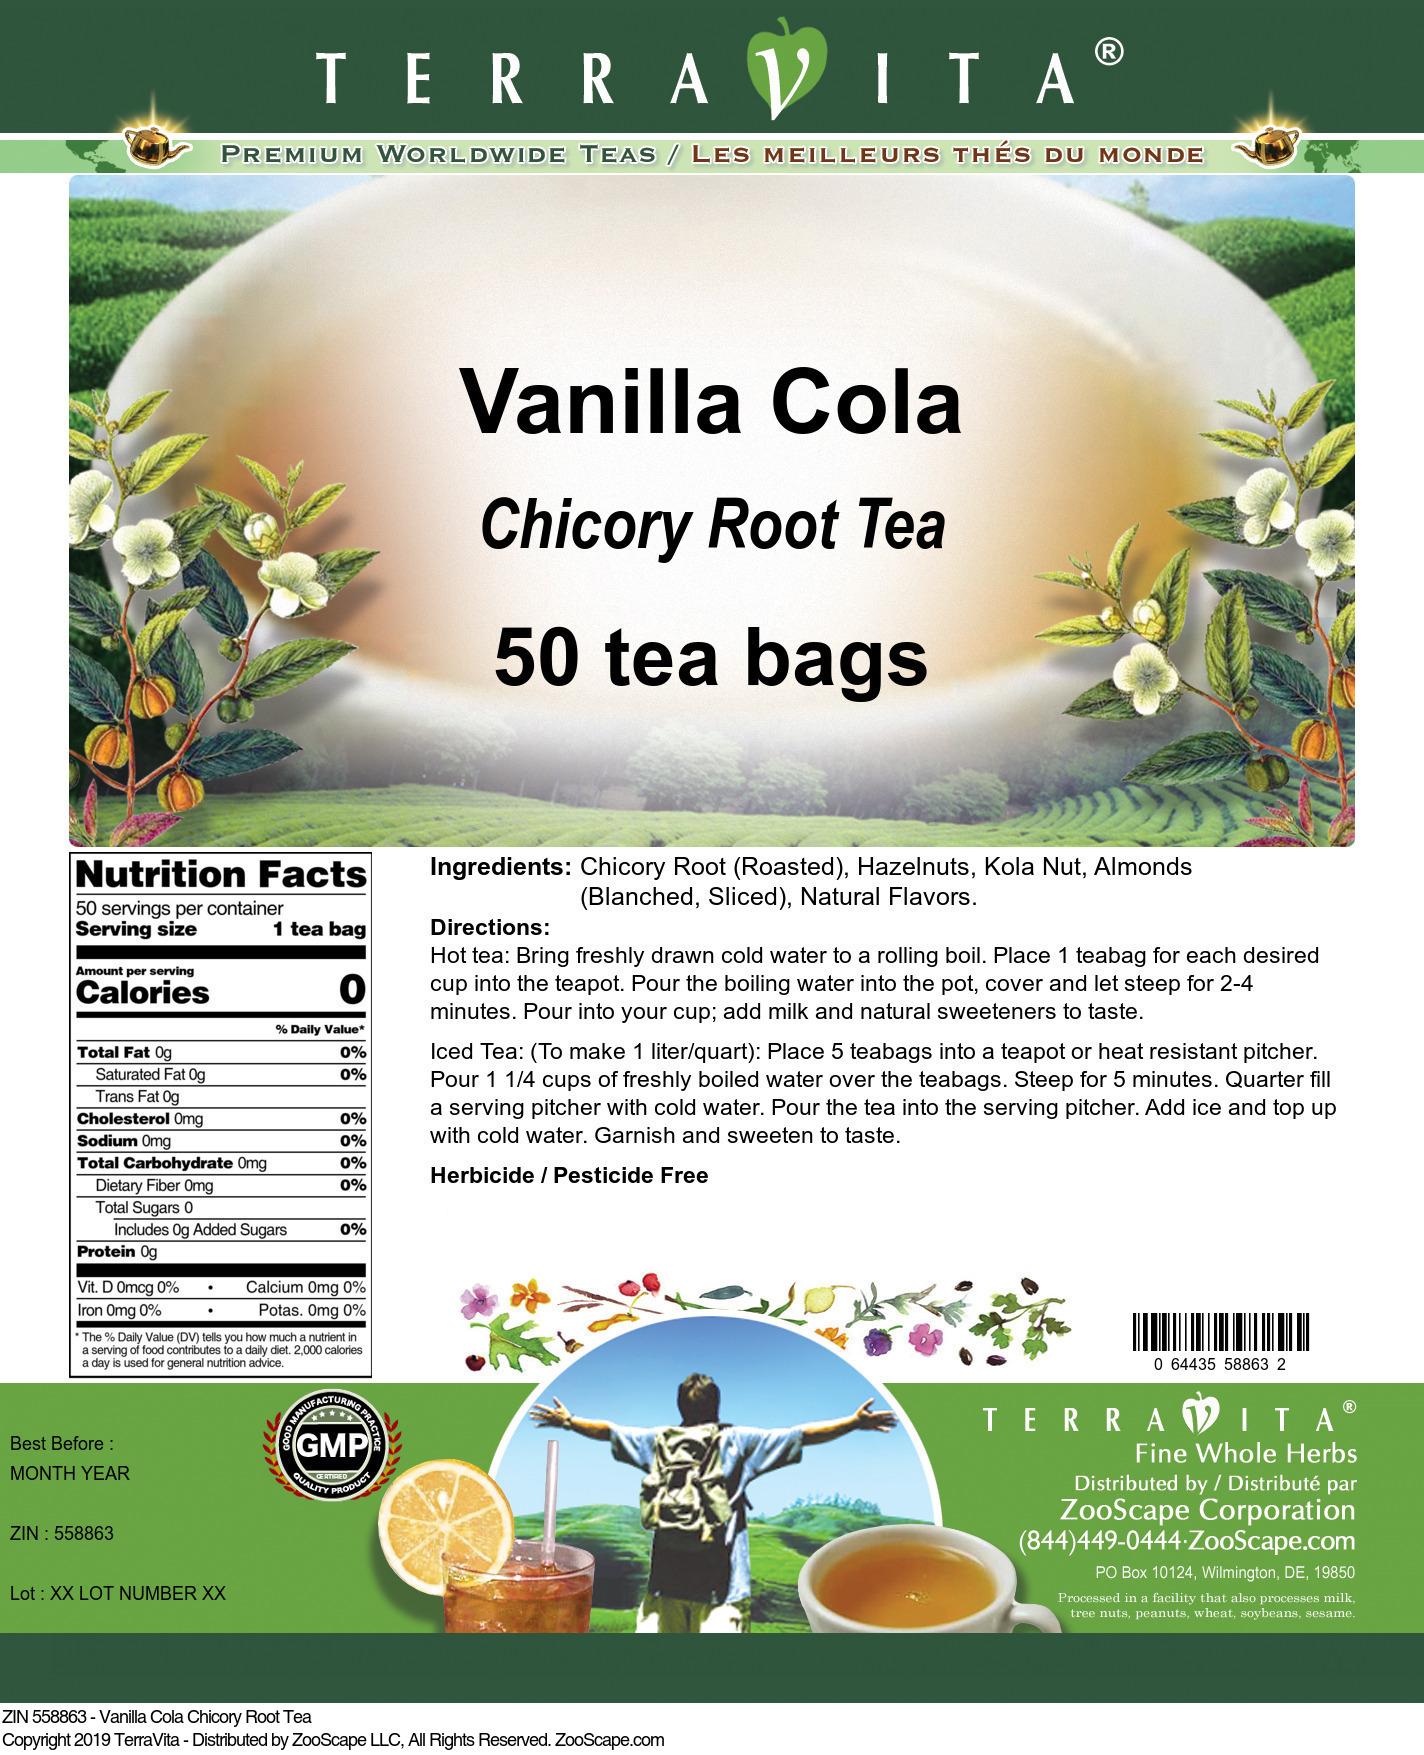 Vanilla Cola Chicory Root Tea